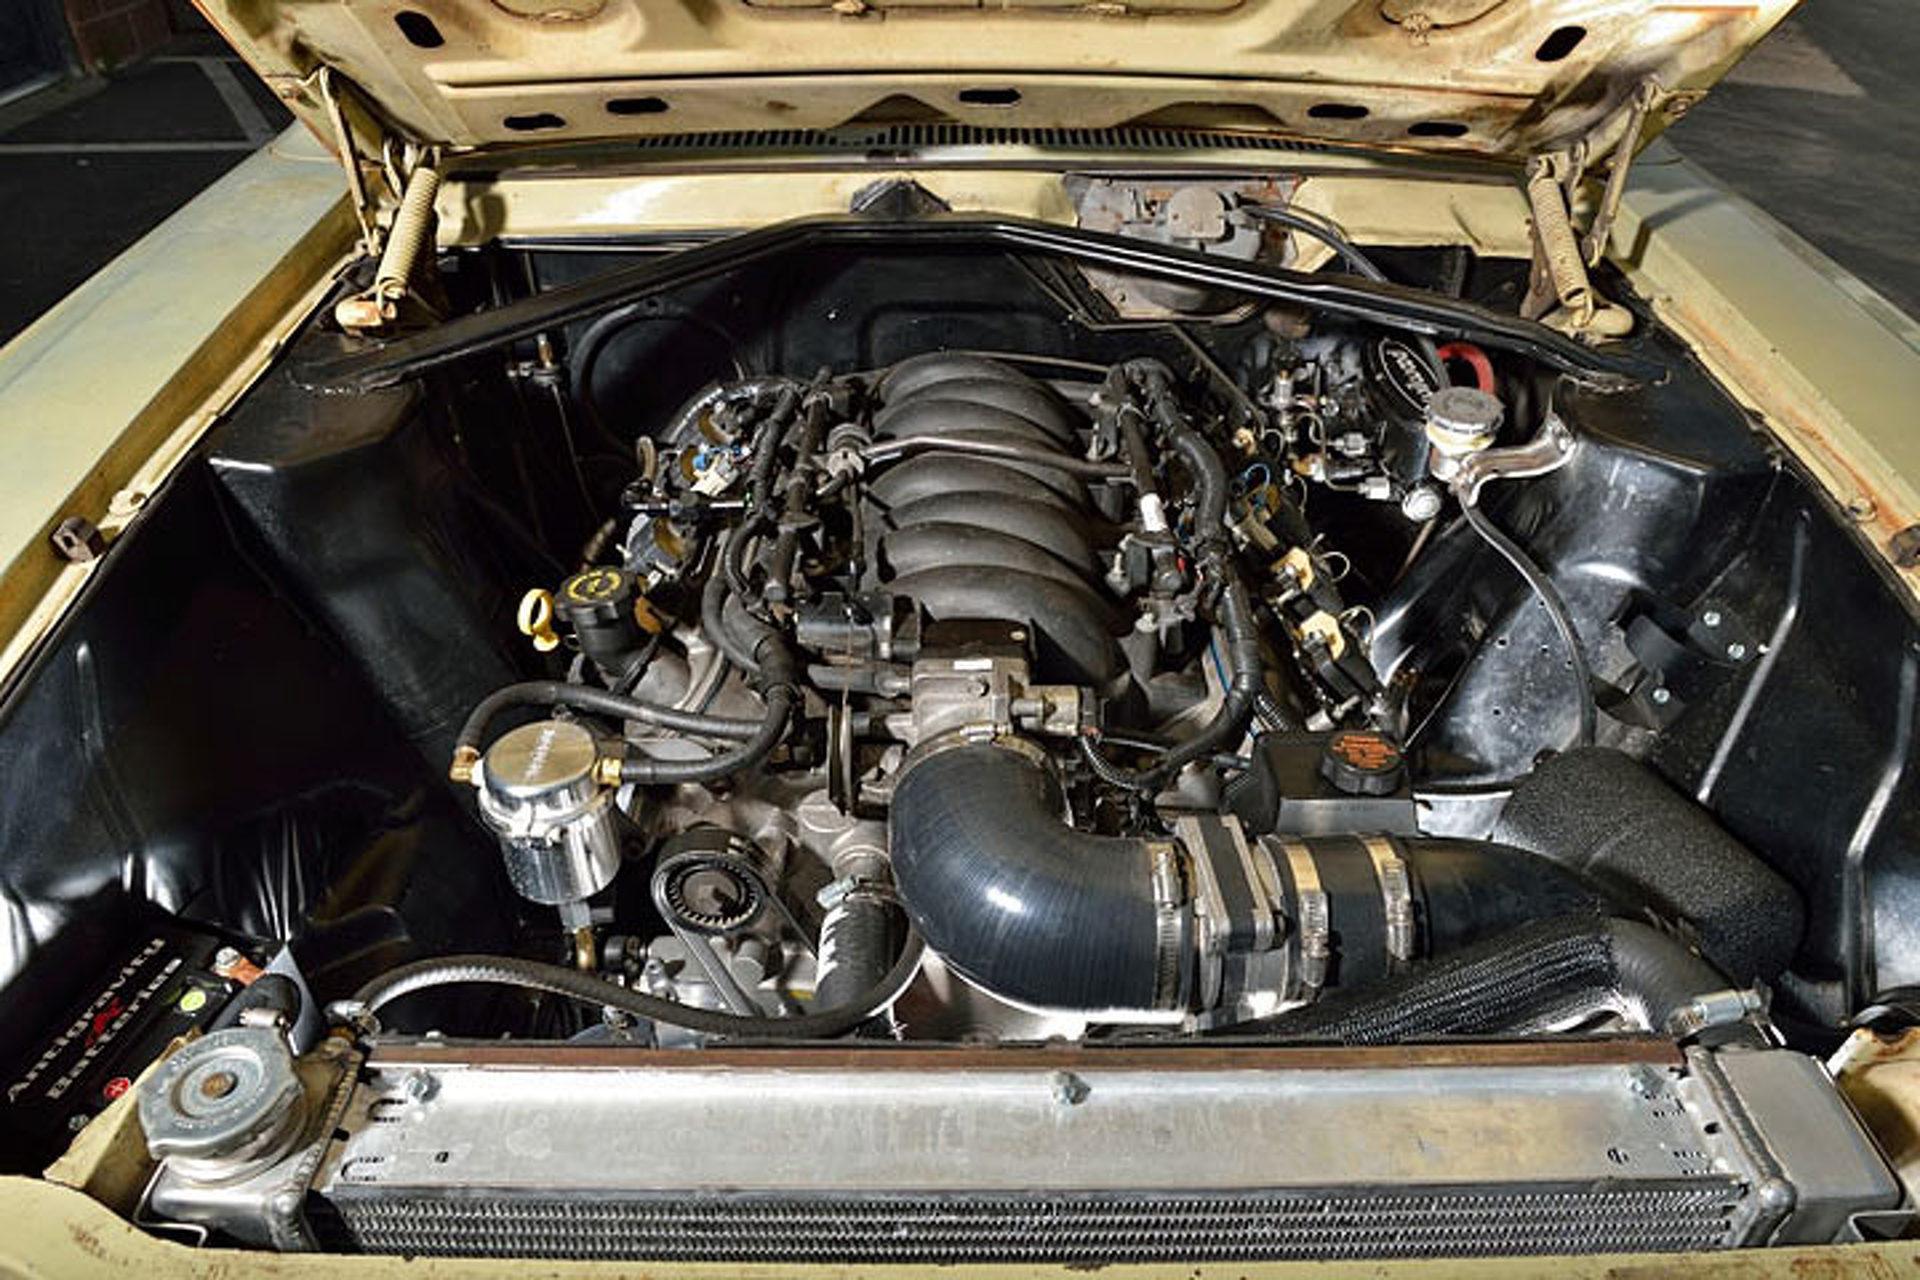 Sleeper Alert: This AMC Rambler Wagon Has a V8 Surprise